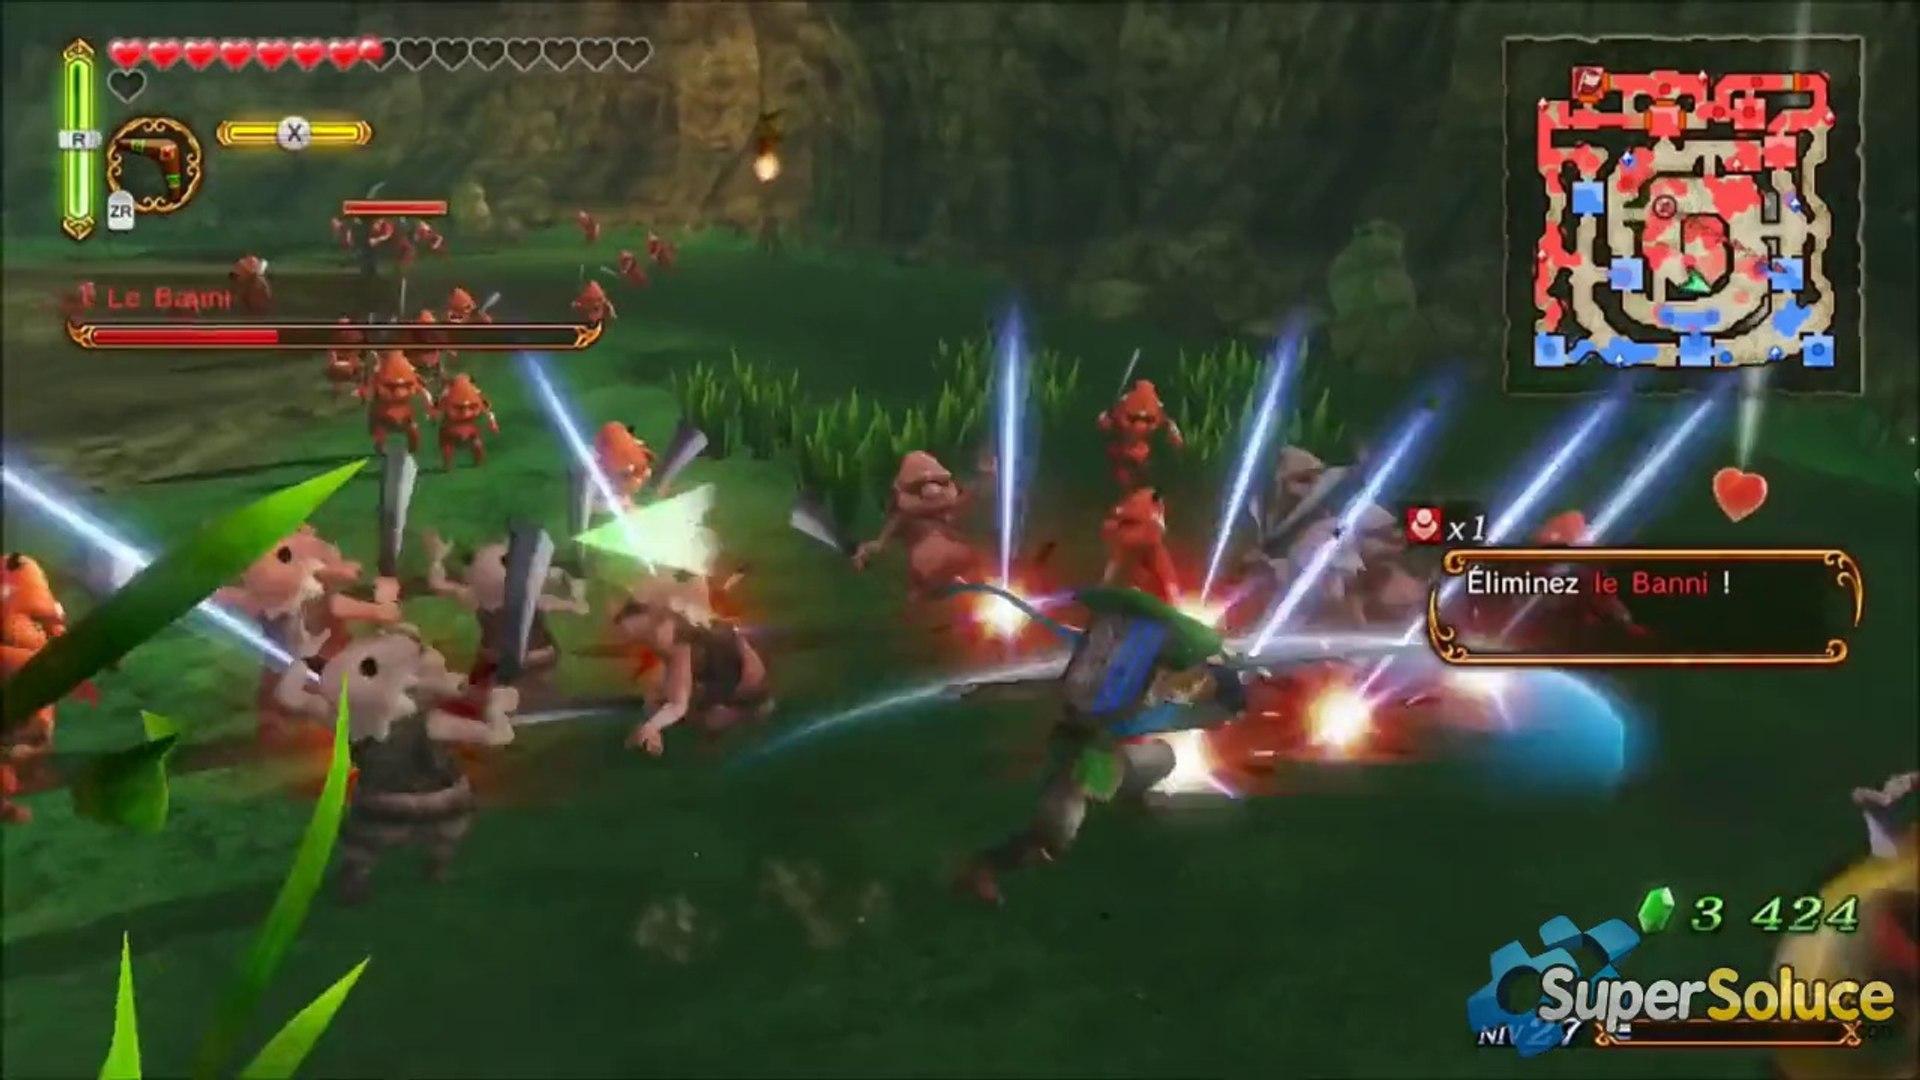 Soluce Hyrule Warriors - Mission 10 - Boss Le Banni